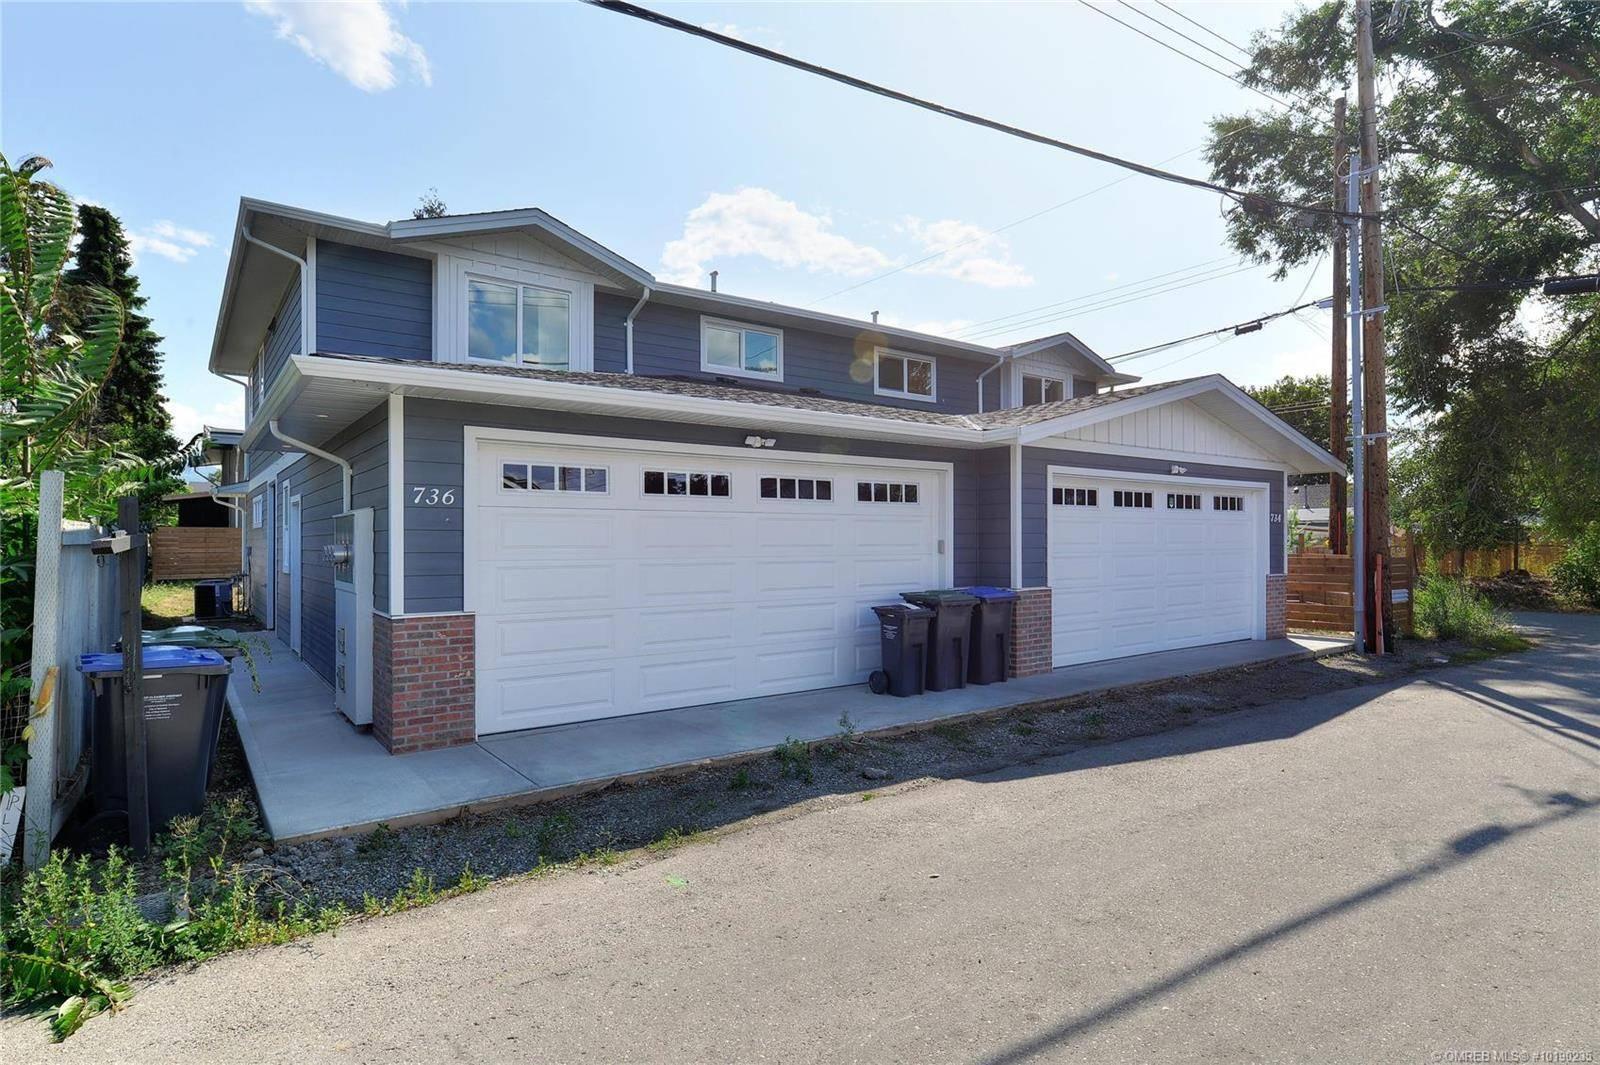 Townhouse for sale at 736 Wardlaw Ave Kelowna British Columbia - MLS: 10190235